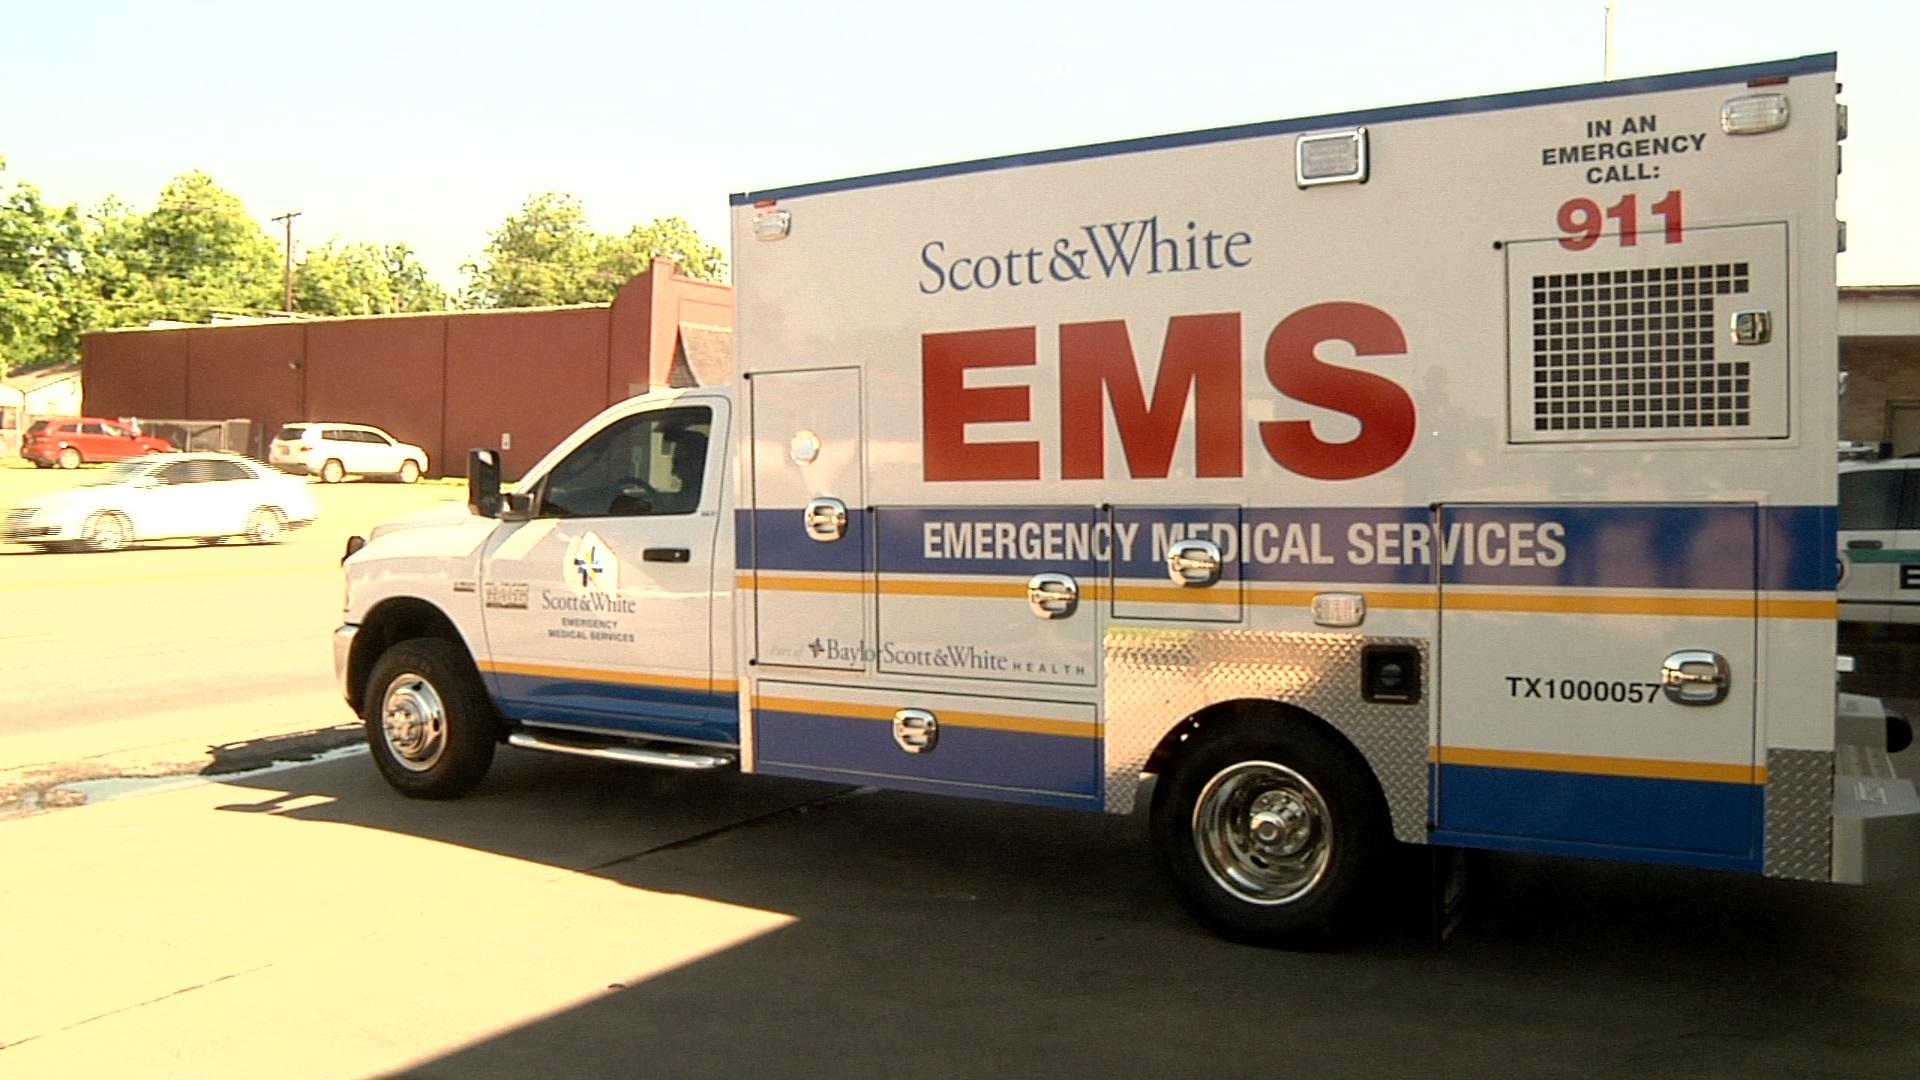 ambulance_1462394999421.jpg